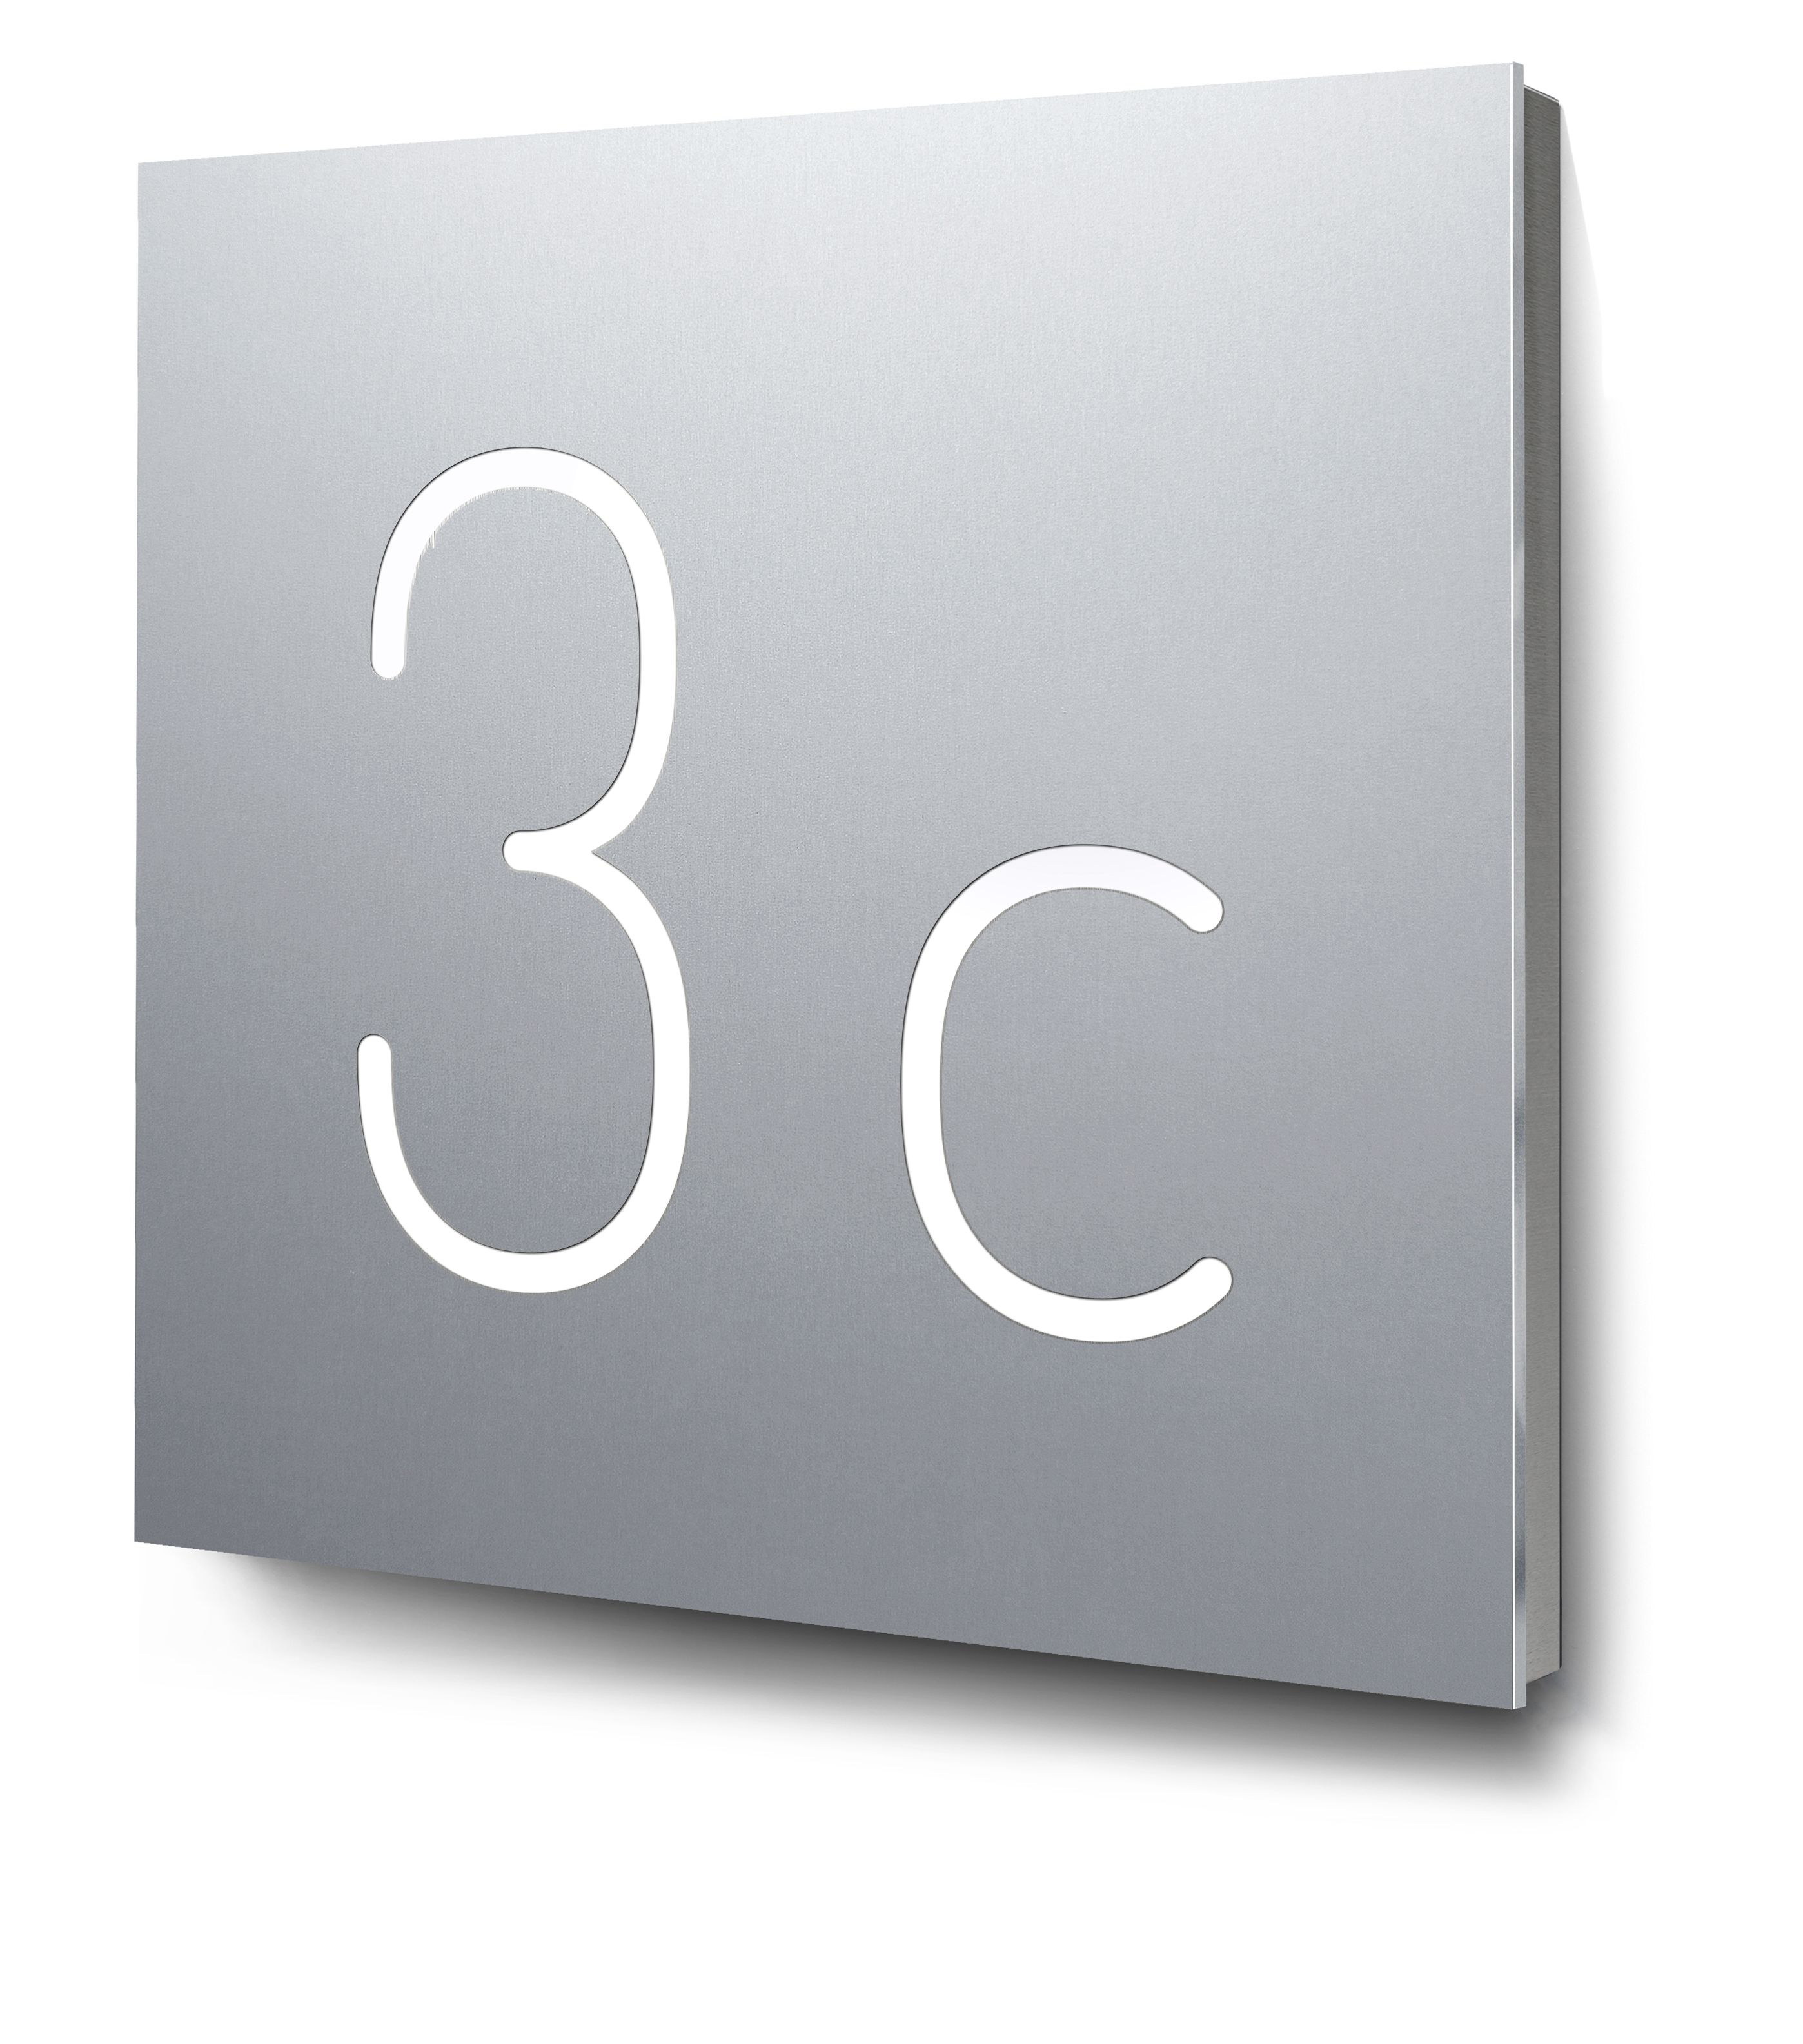 Hausnummer Zweieistellig Beleuchtet In Aluminium Hausnummer Hausnummernschild Dammerungsschalter Aluminium Be Hausnummer Beleuchtet Hausnummern Beleuchten